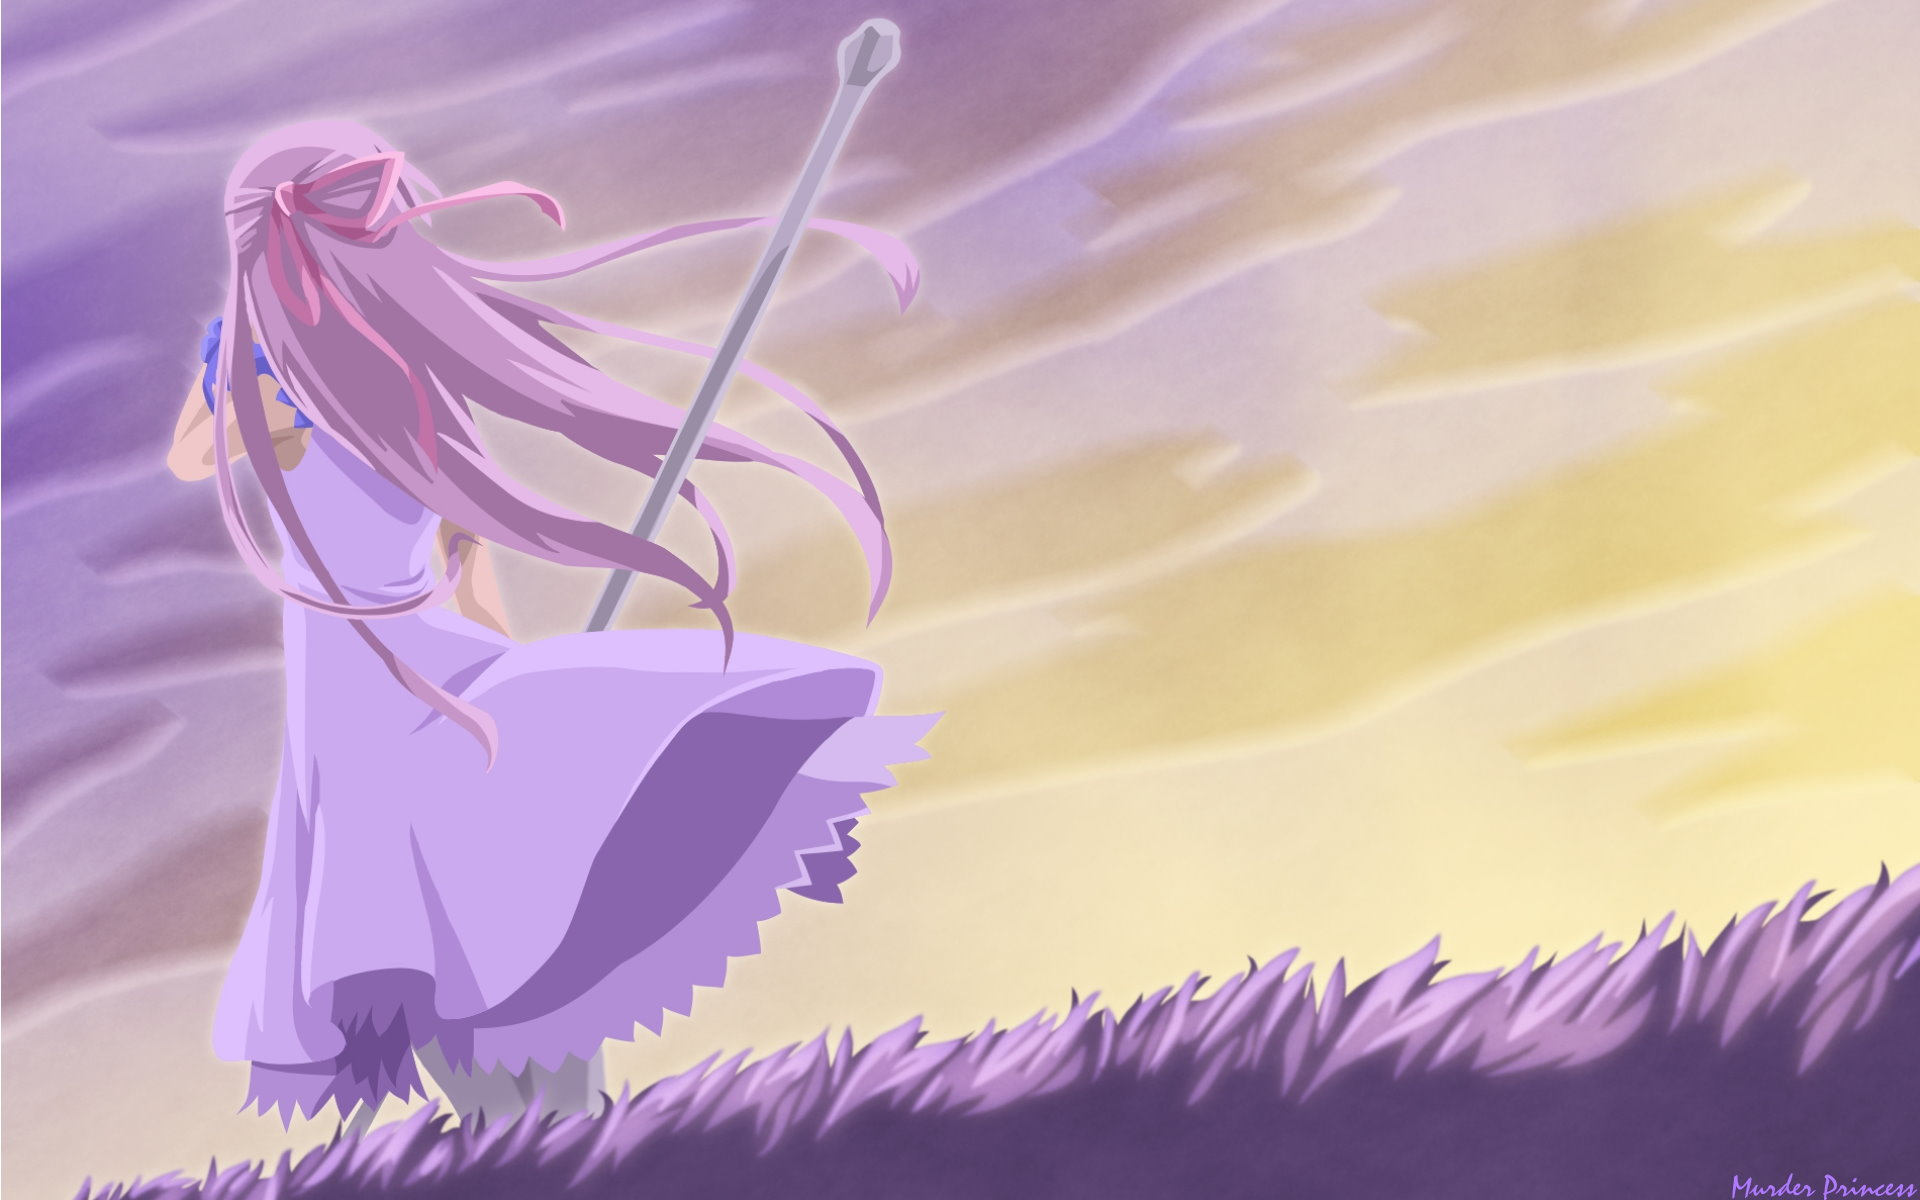 Anime Girl Alone Chrome Geek